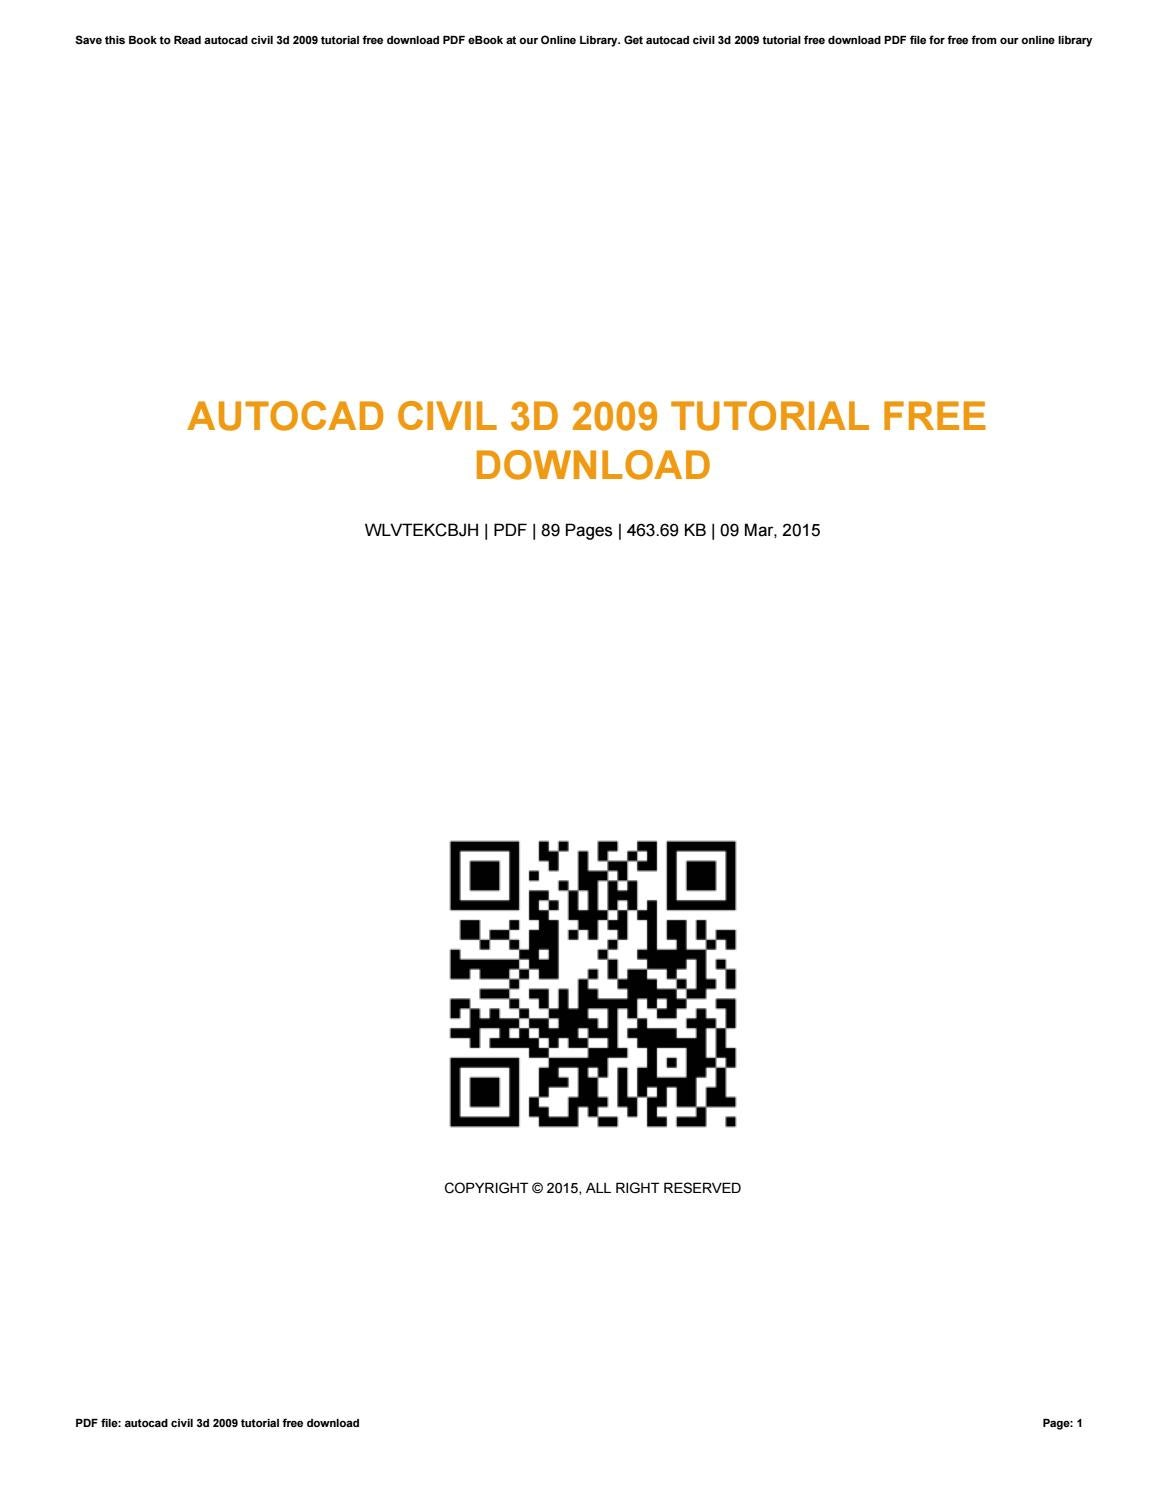 Autocad civil 3d 2009 tutorial free download by MajorReimer2716 - issuu